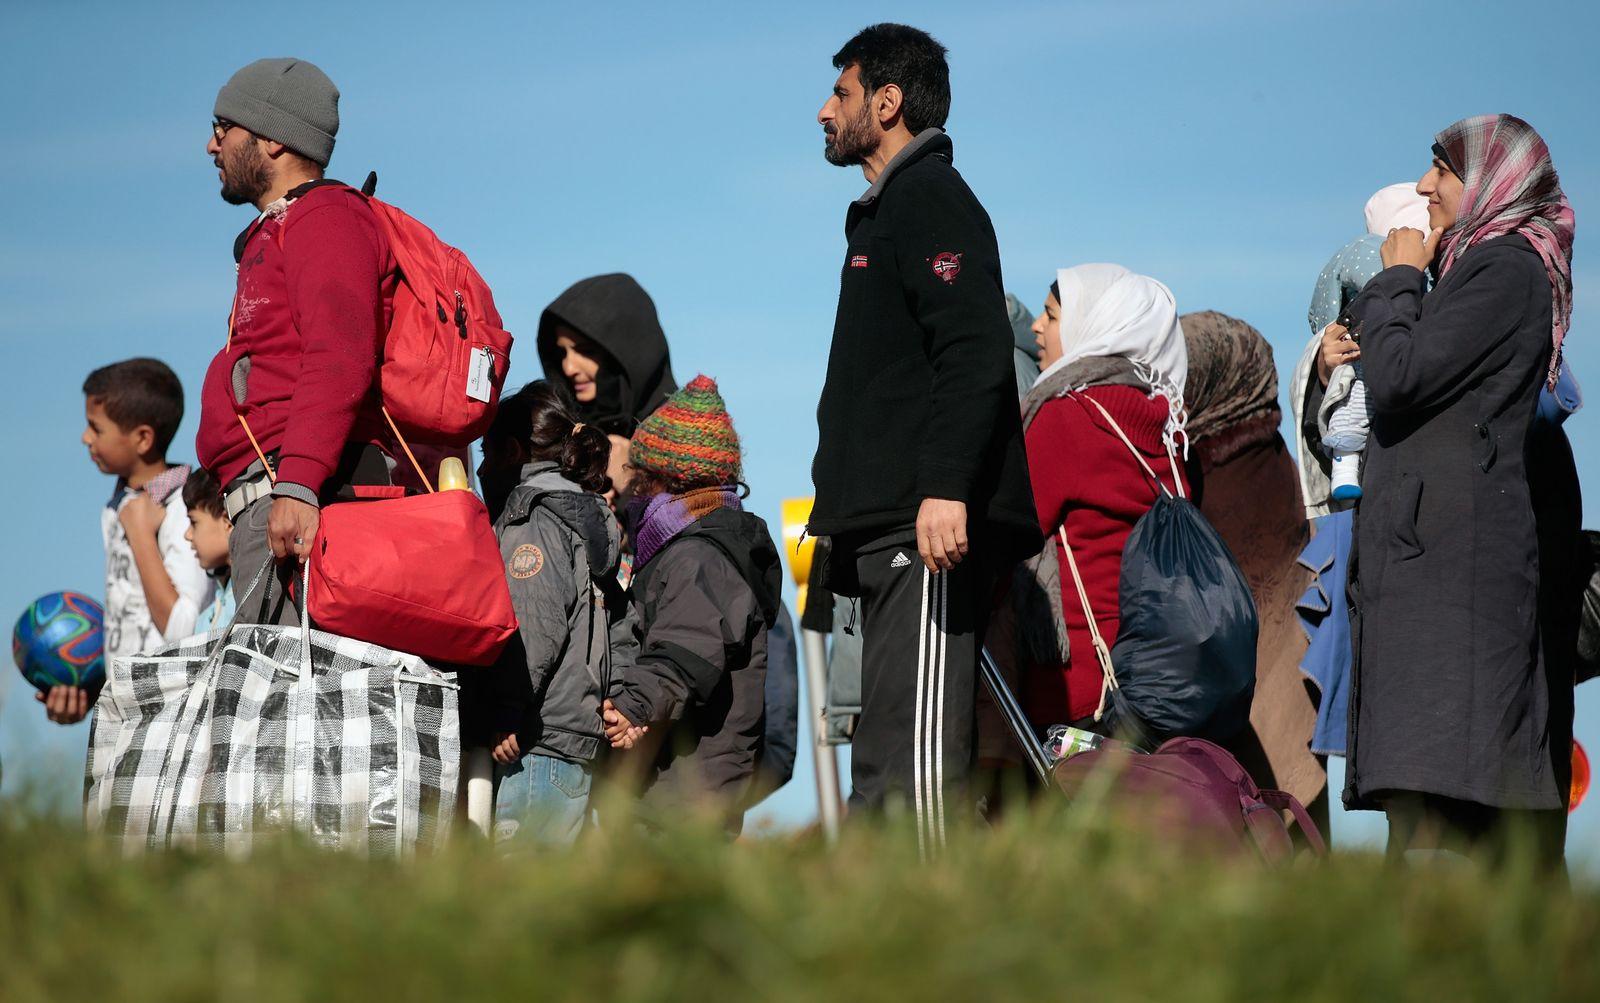 Flüchtlinge/Bayern